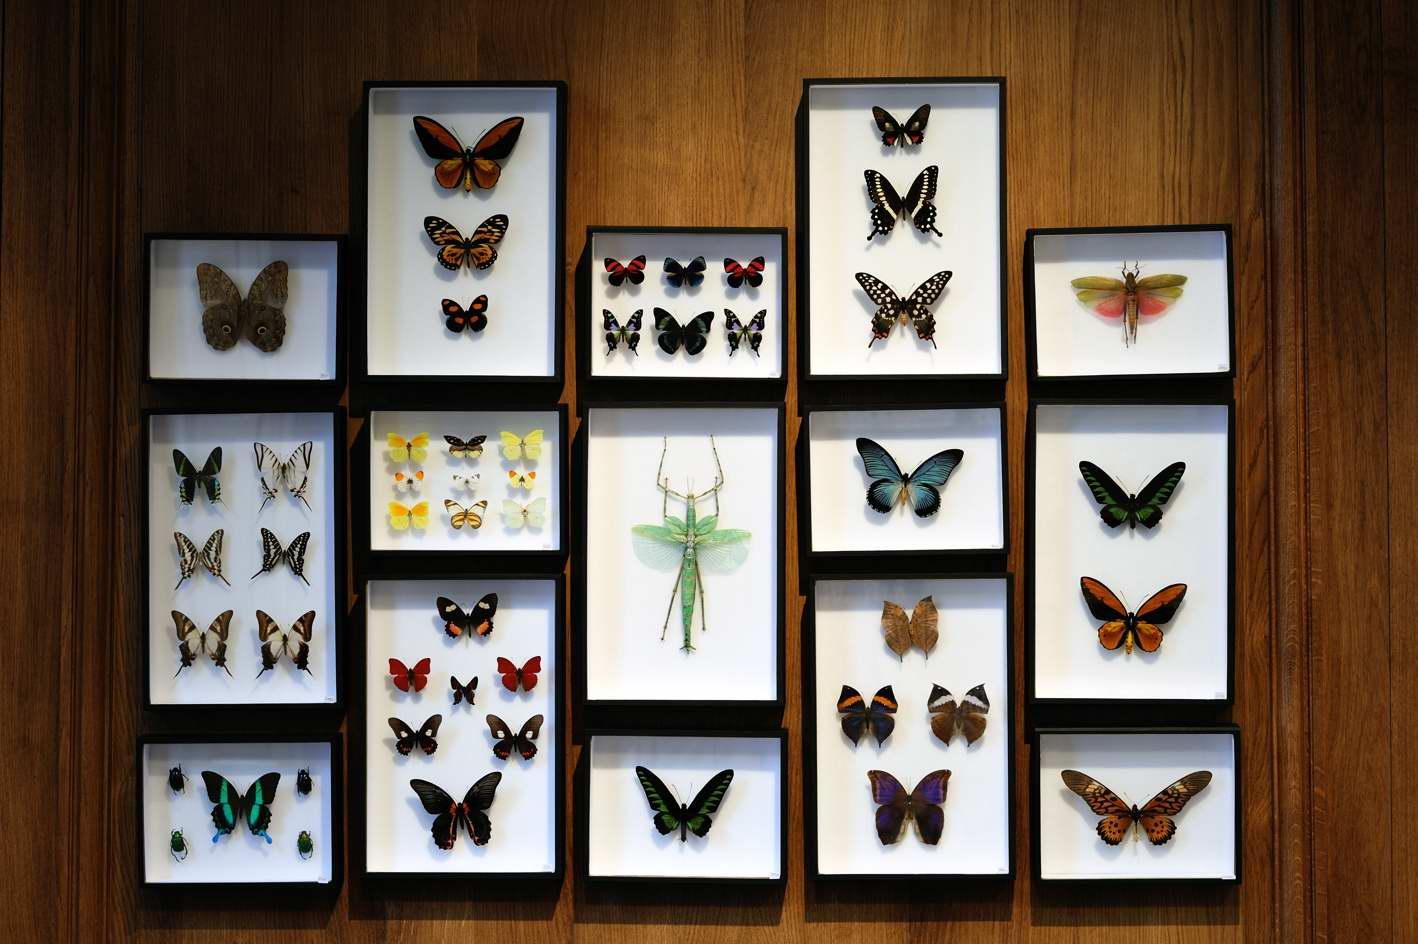 Très Entomologie - Deyrolle HA61